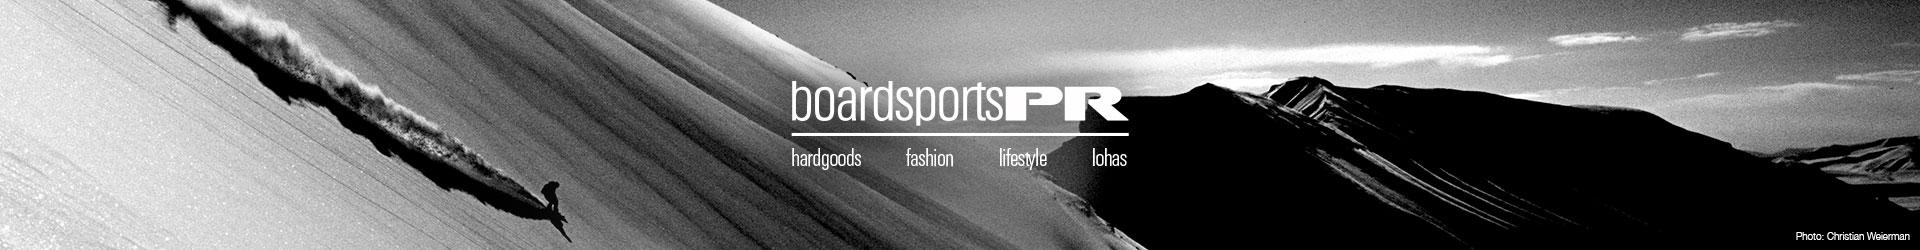 boardsportsPR.com